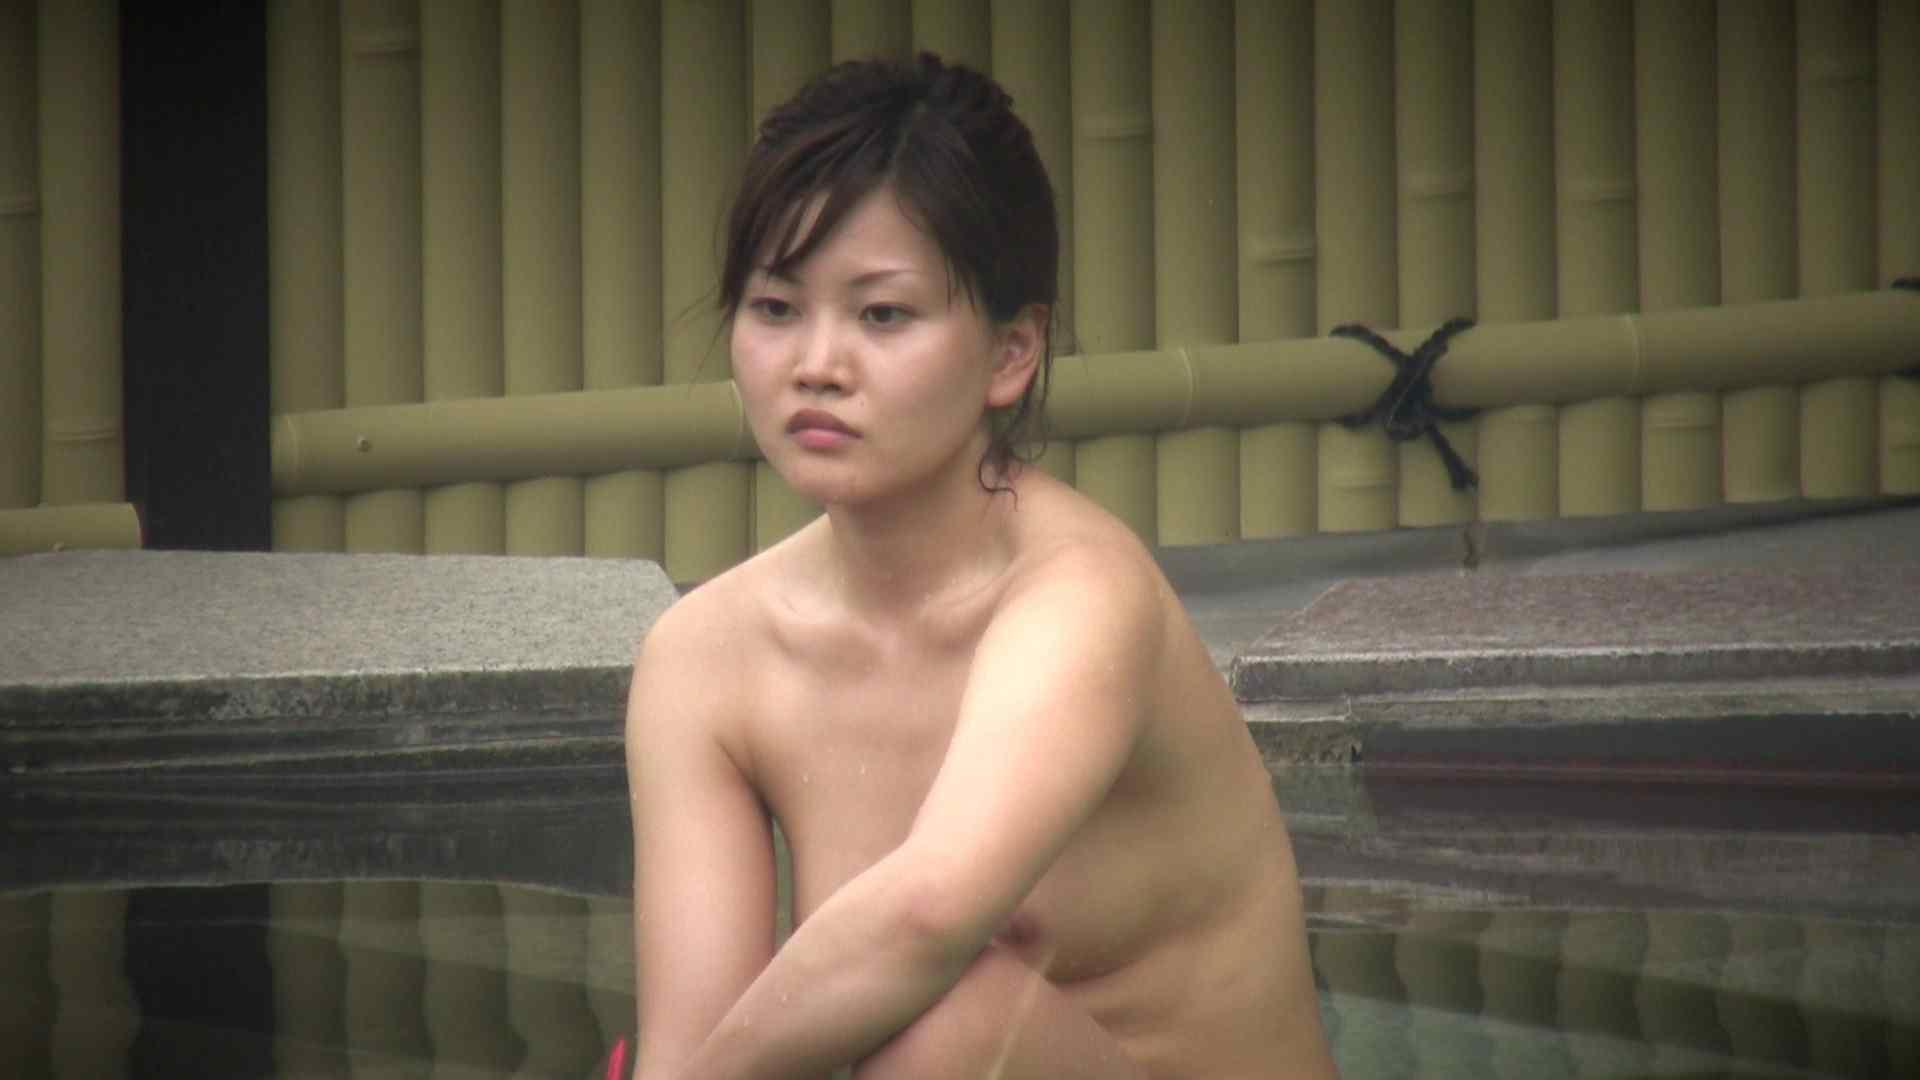 Aquaな露天風呂Vol.125 露天  88連発 17